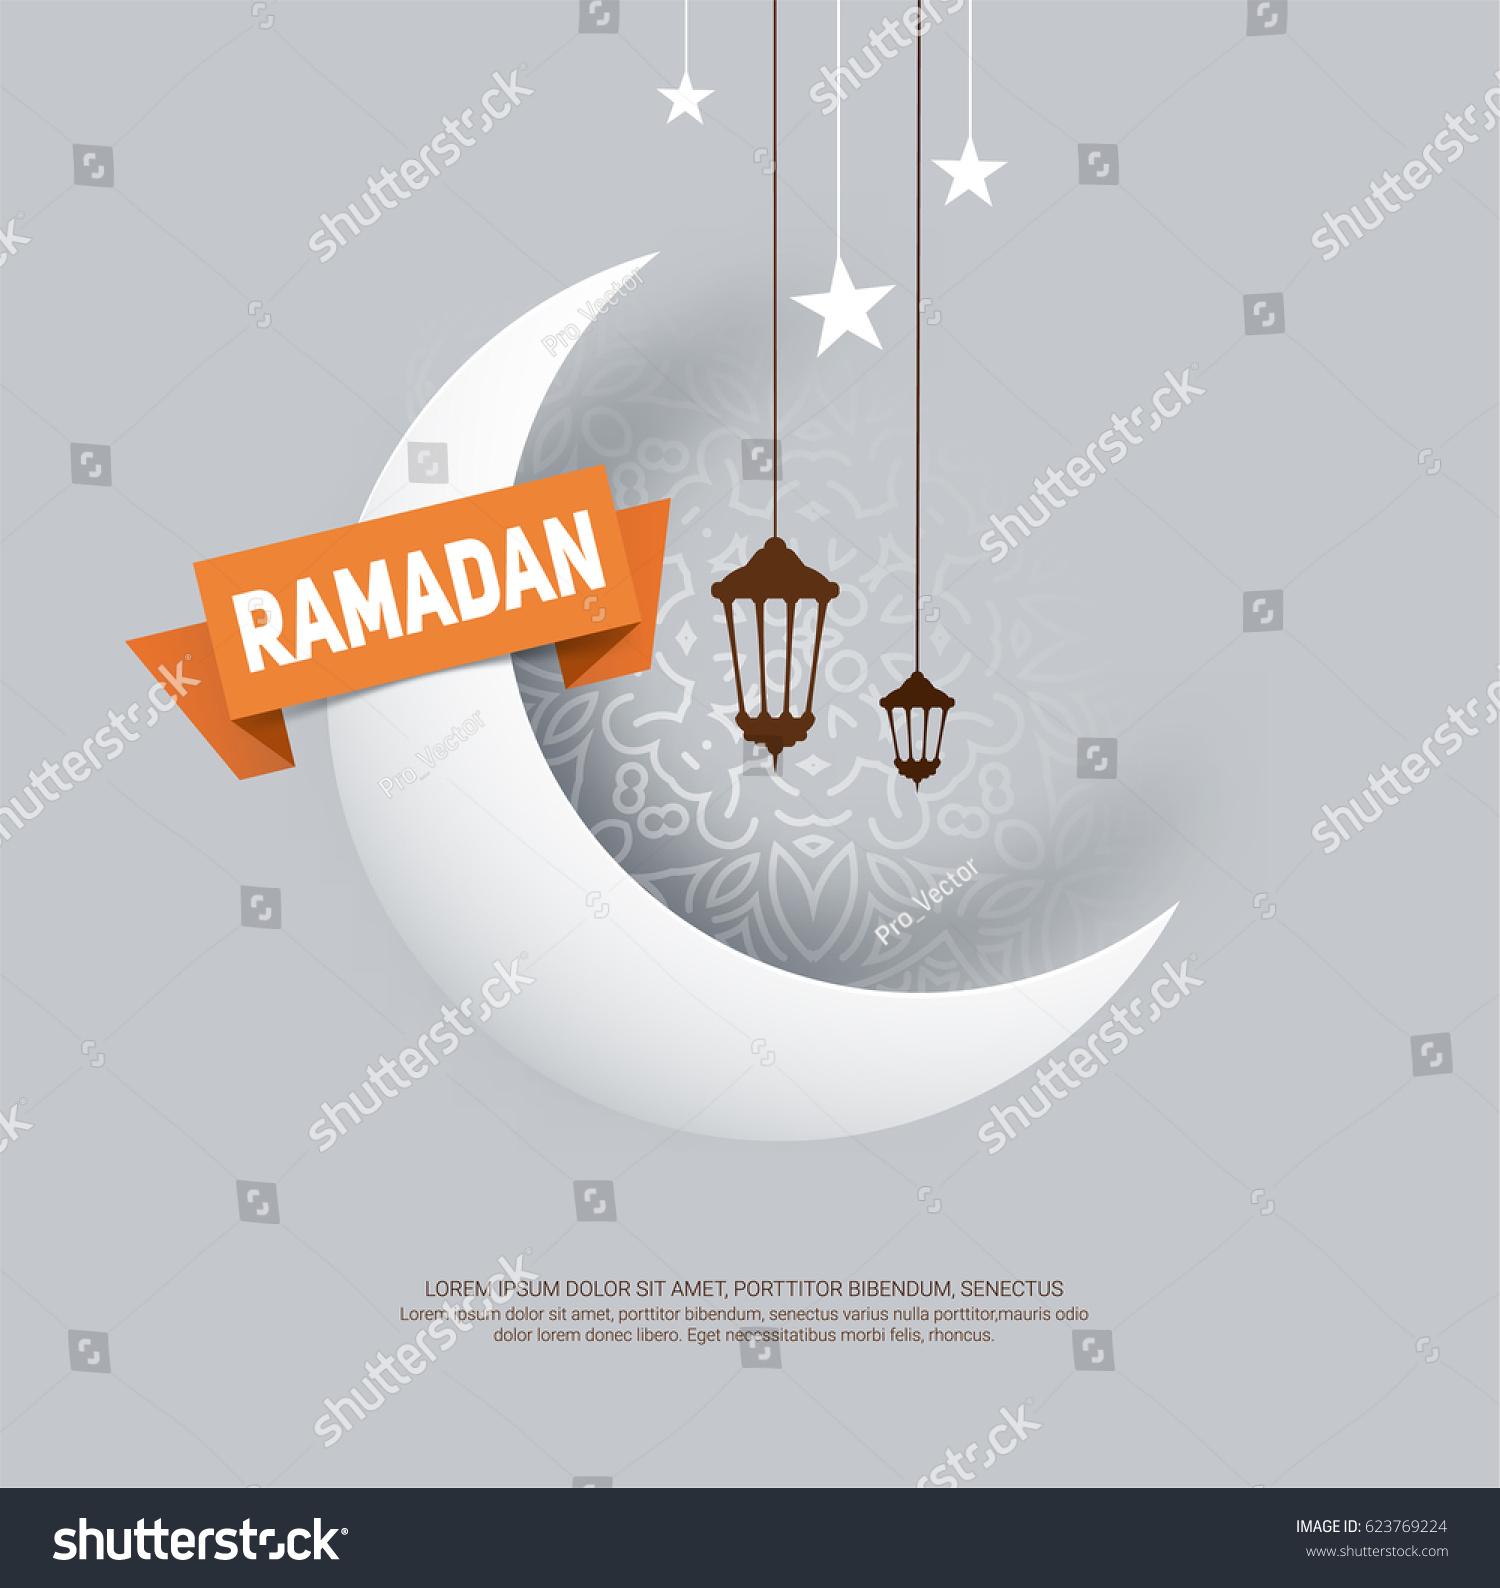 Ramadan kareem greeting card paper crescent stock vector 623769224 ramadan kareem greeting card with paper crescent moon ribbon stars and ramadan lantern kristyandbryce Image collections